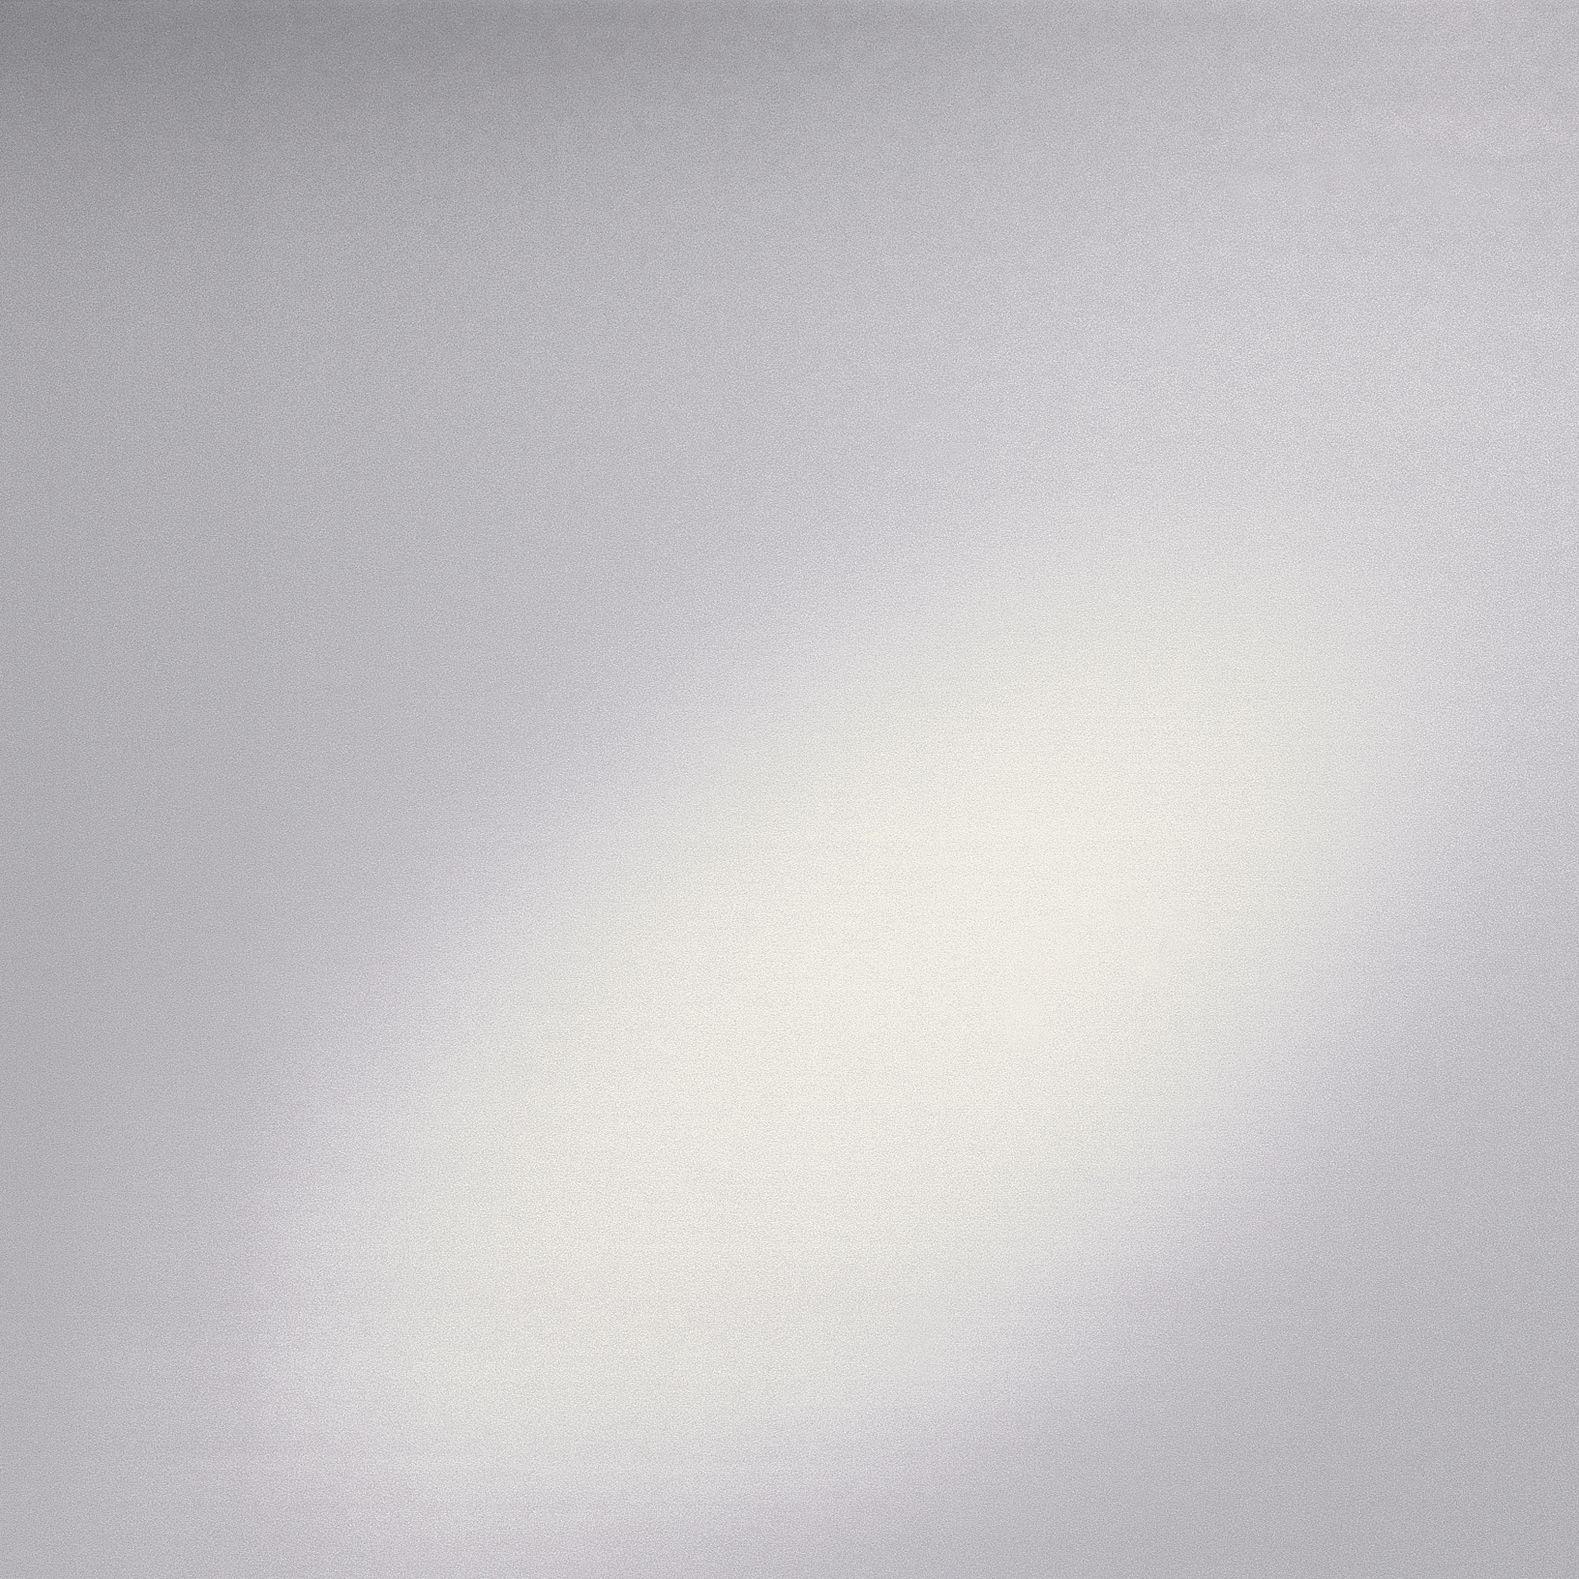 D C Fix Frosted Effect Static Cling Window Film L 1 5m W